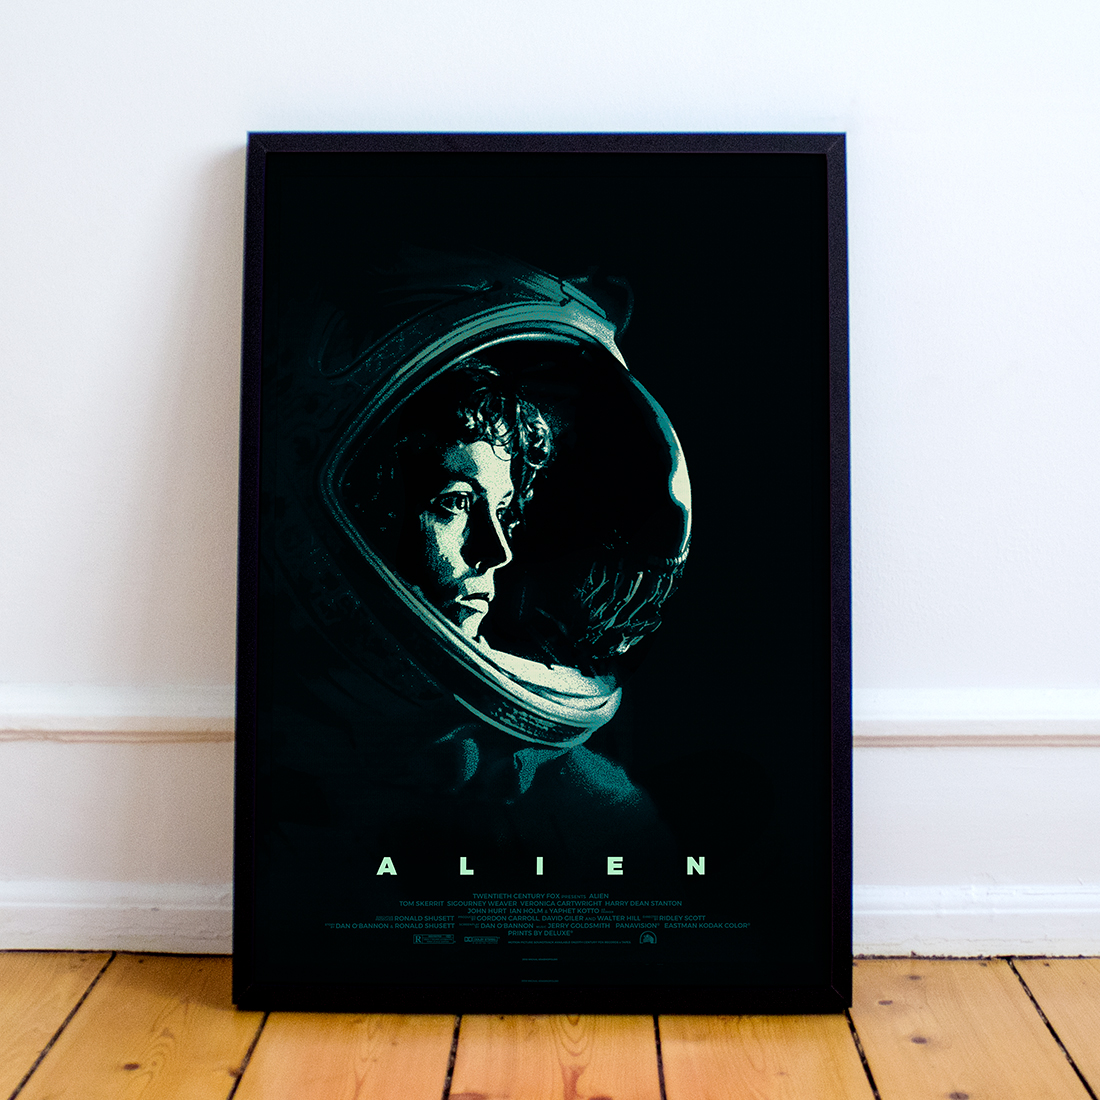 krasnopolski_alien-v2_vis.jpg